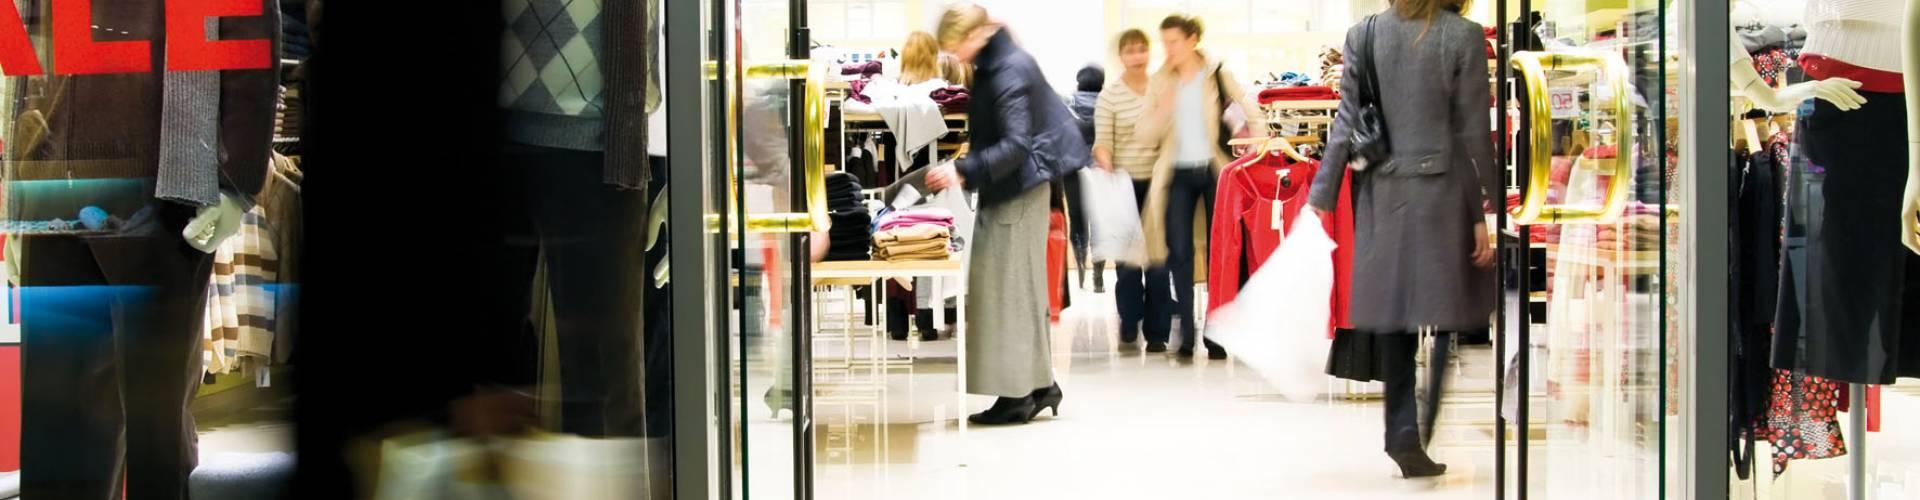 langwies 1 + 2 shopping centers junglinster